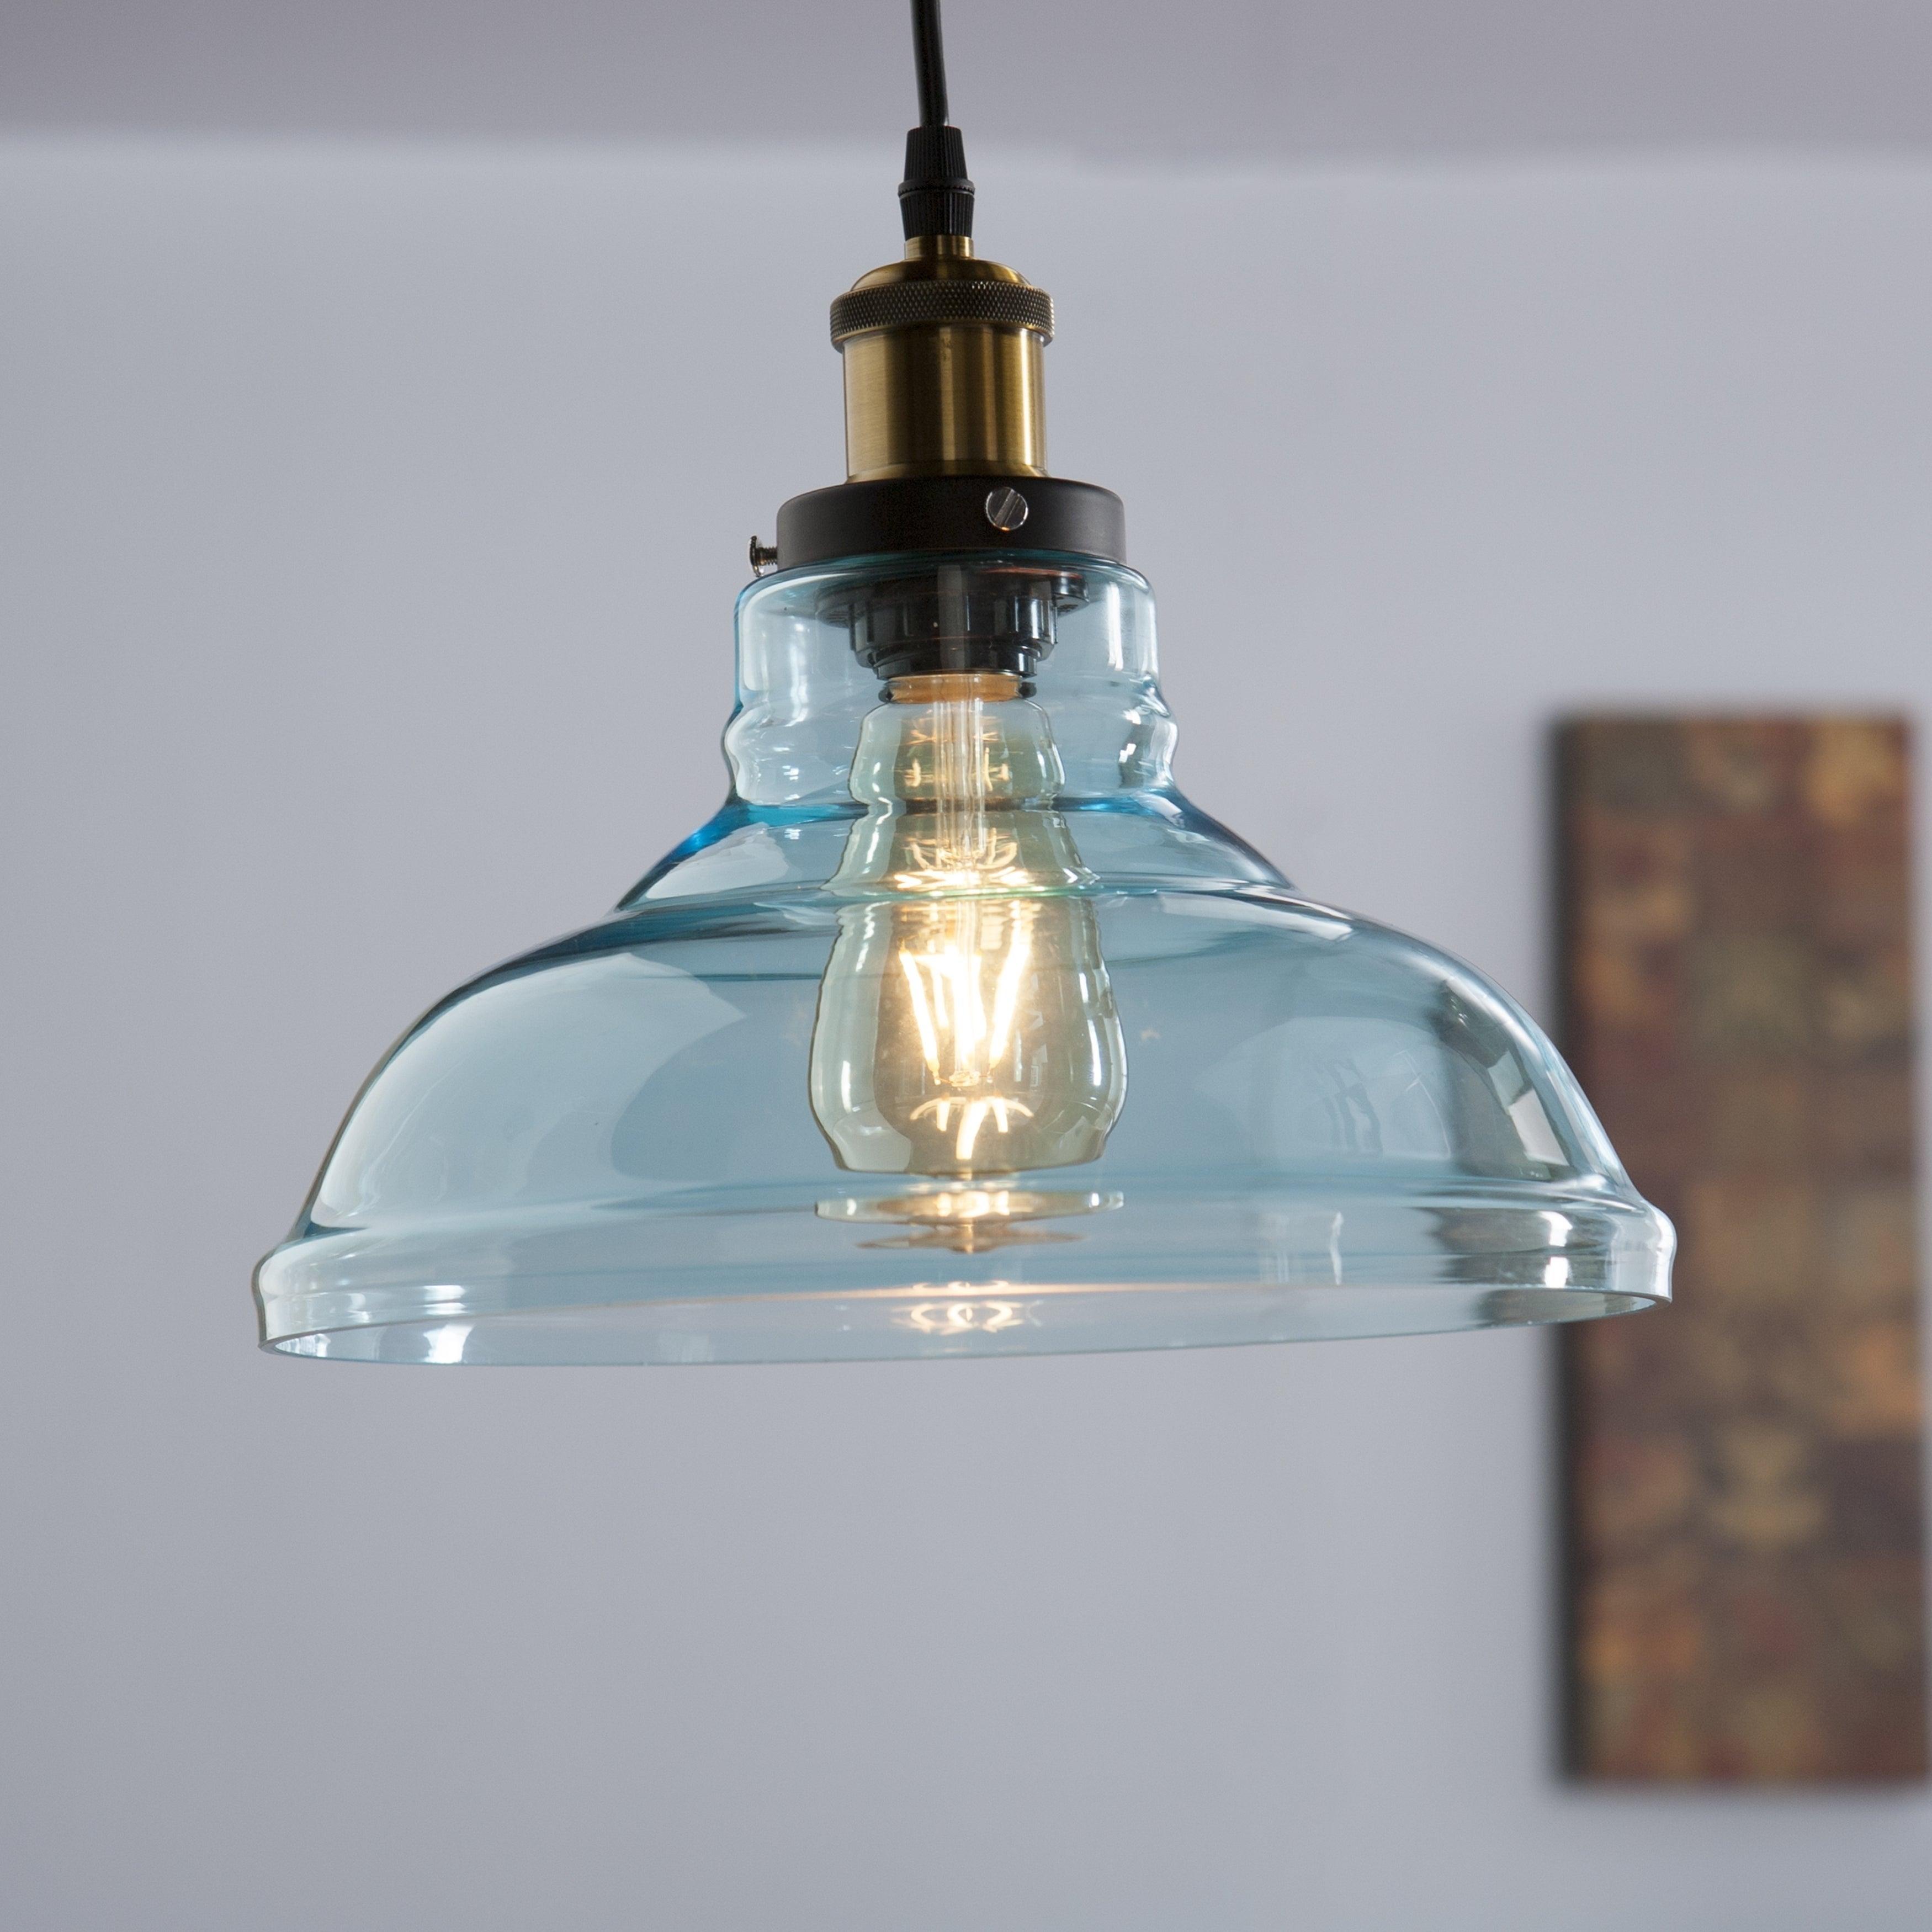 Harper Blvd Gracie Colored Glass Bell Pendant Lamp - Soft...